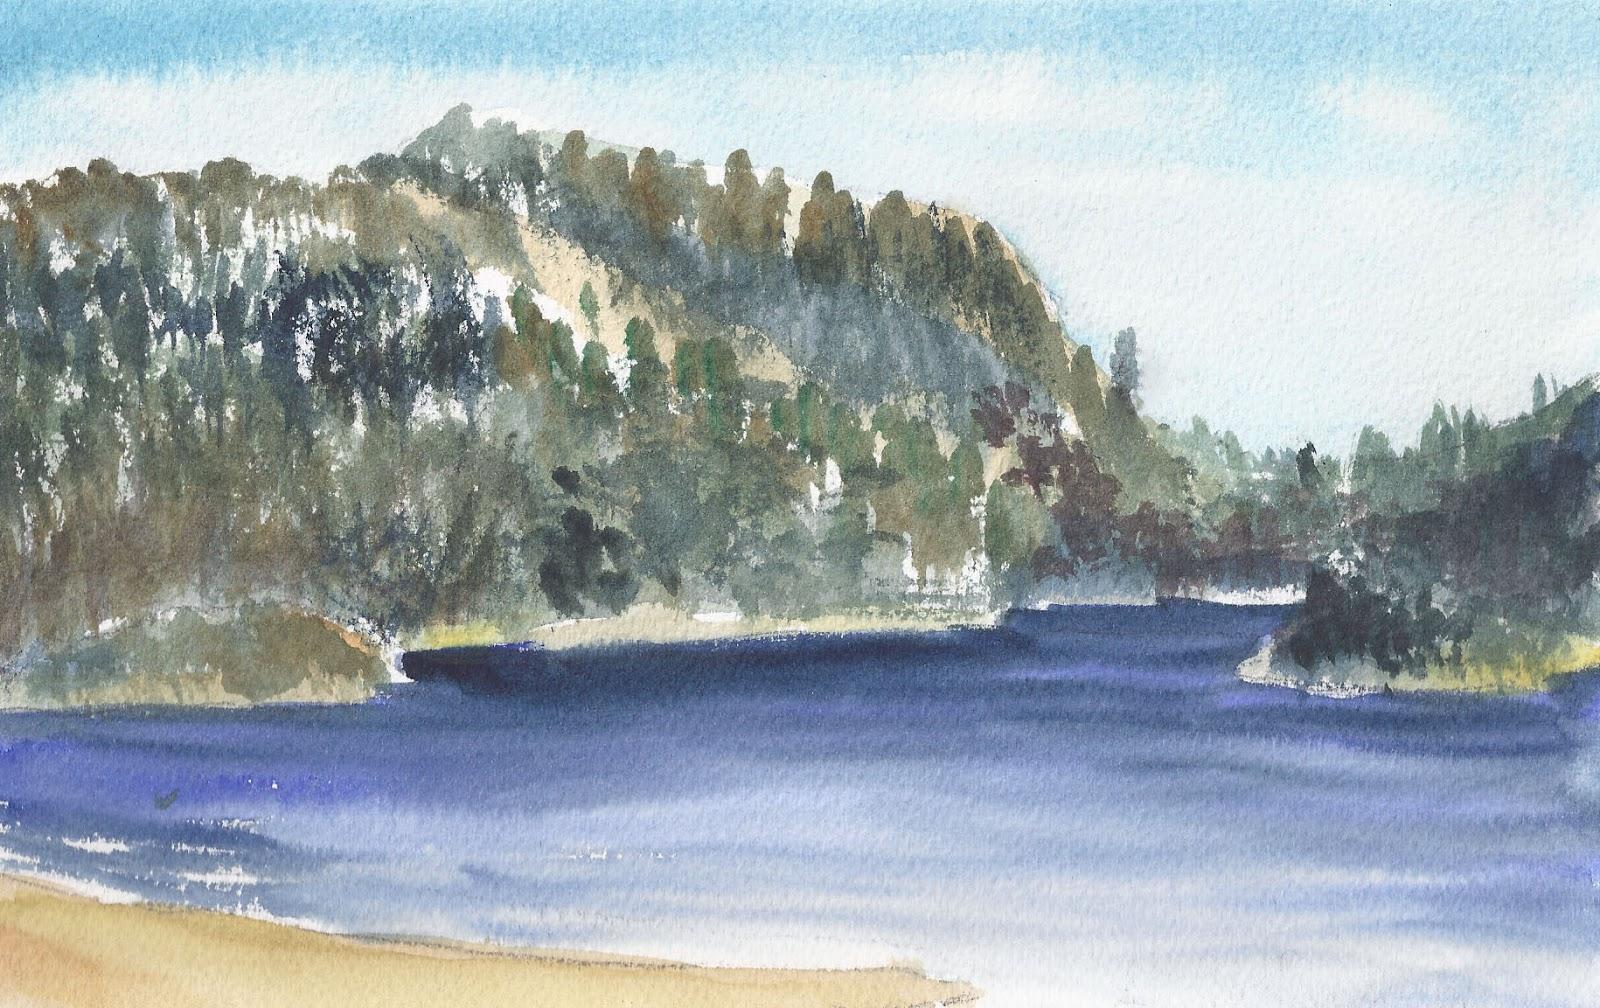 Table on sandy beach lac monroe mont tremblant quebec for Lac miroir mont tremblant